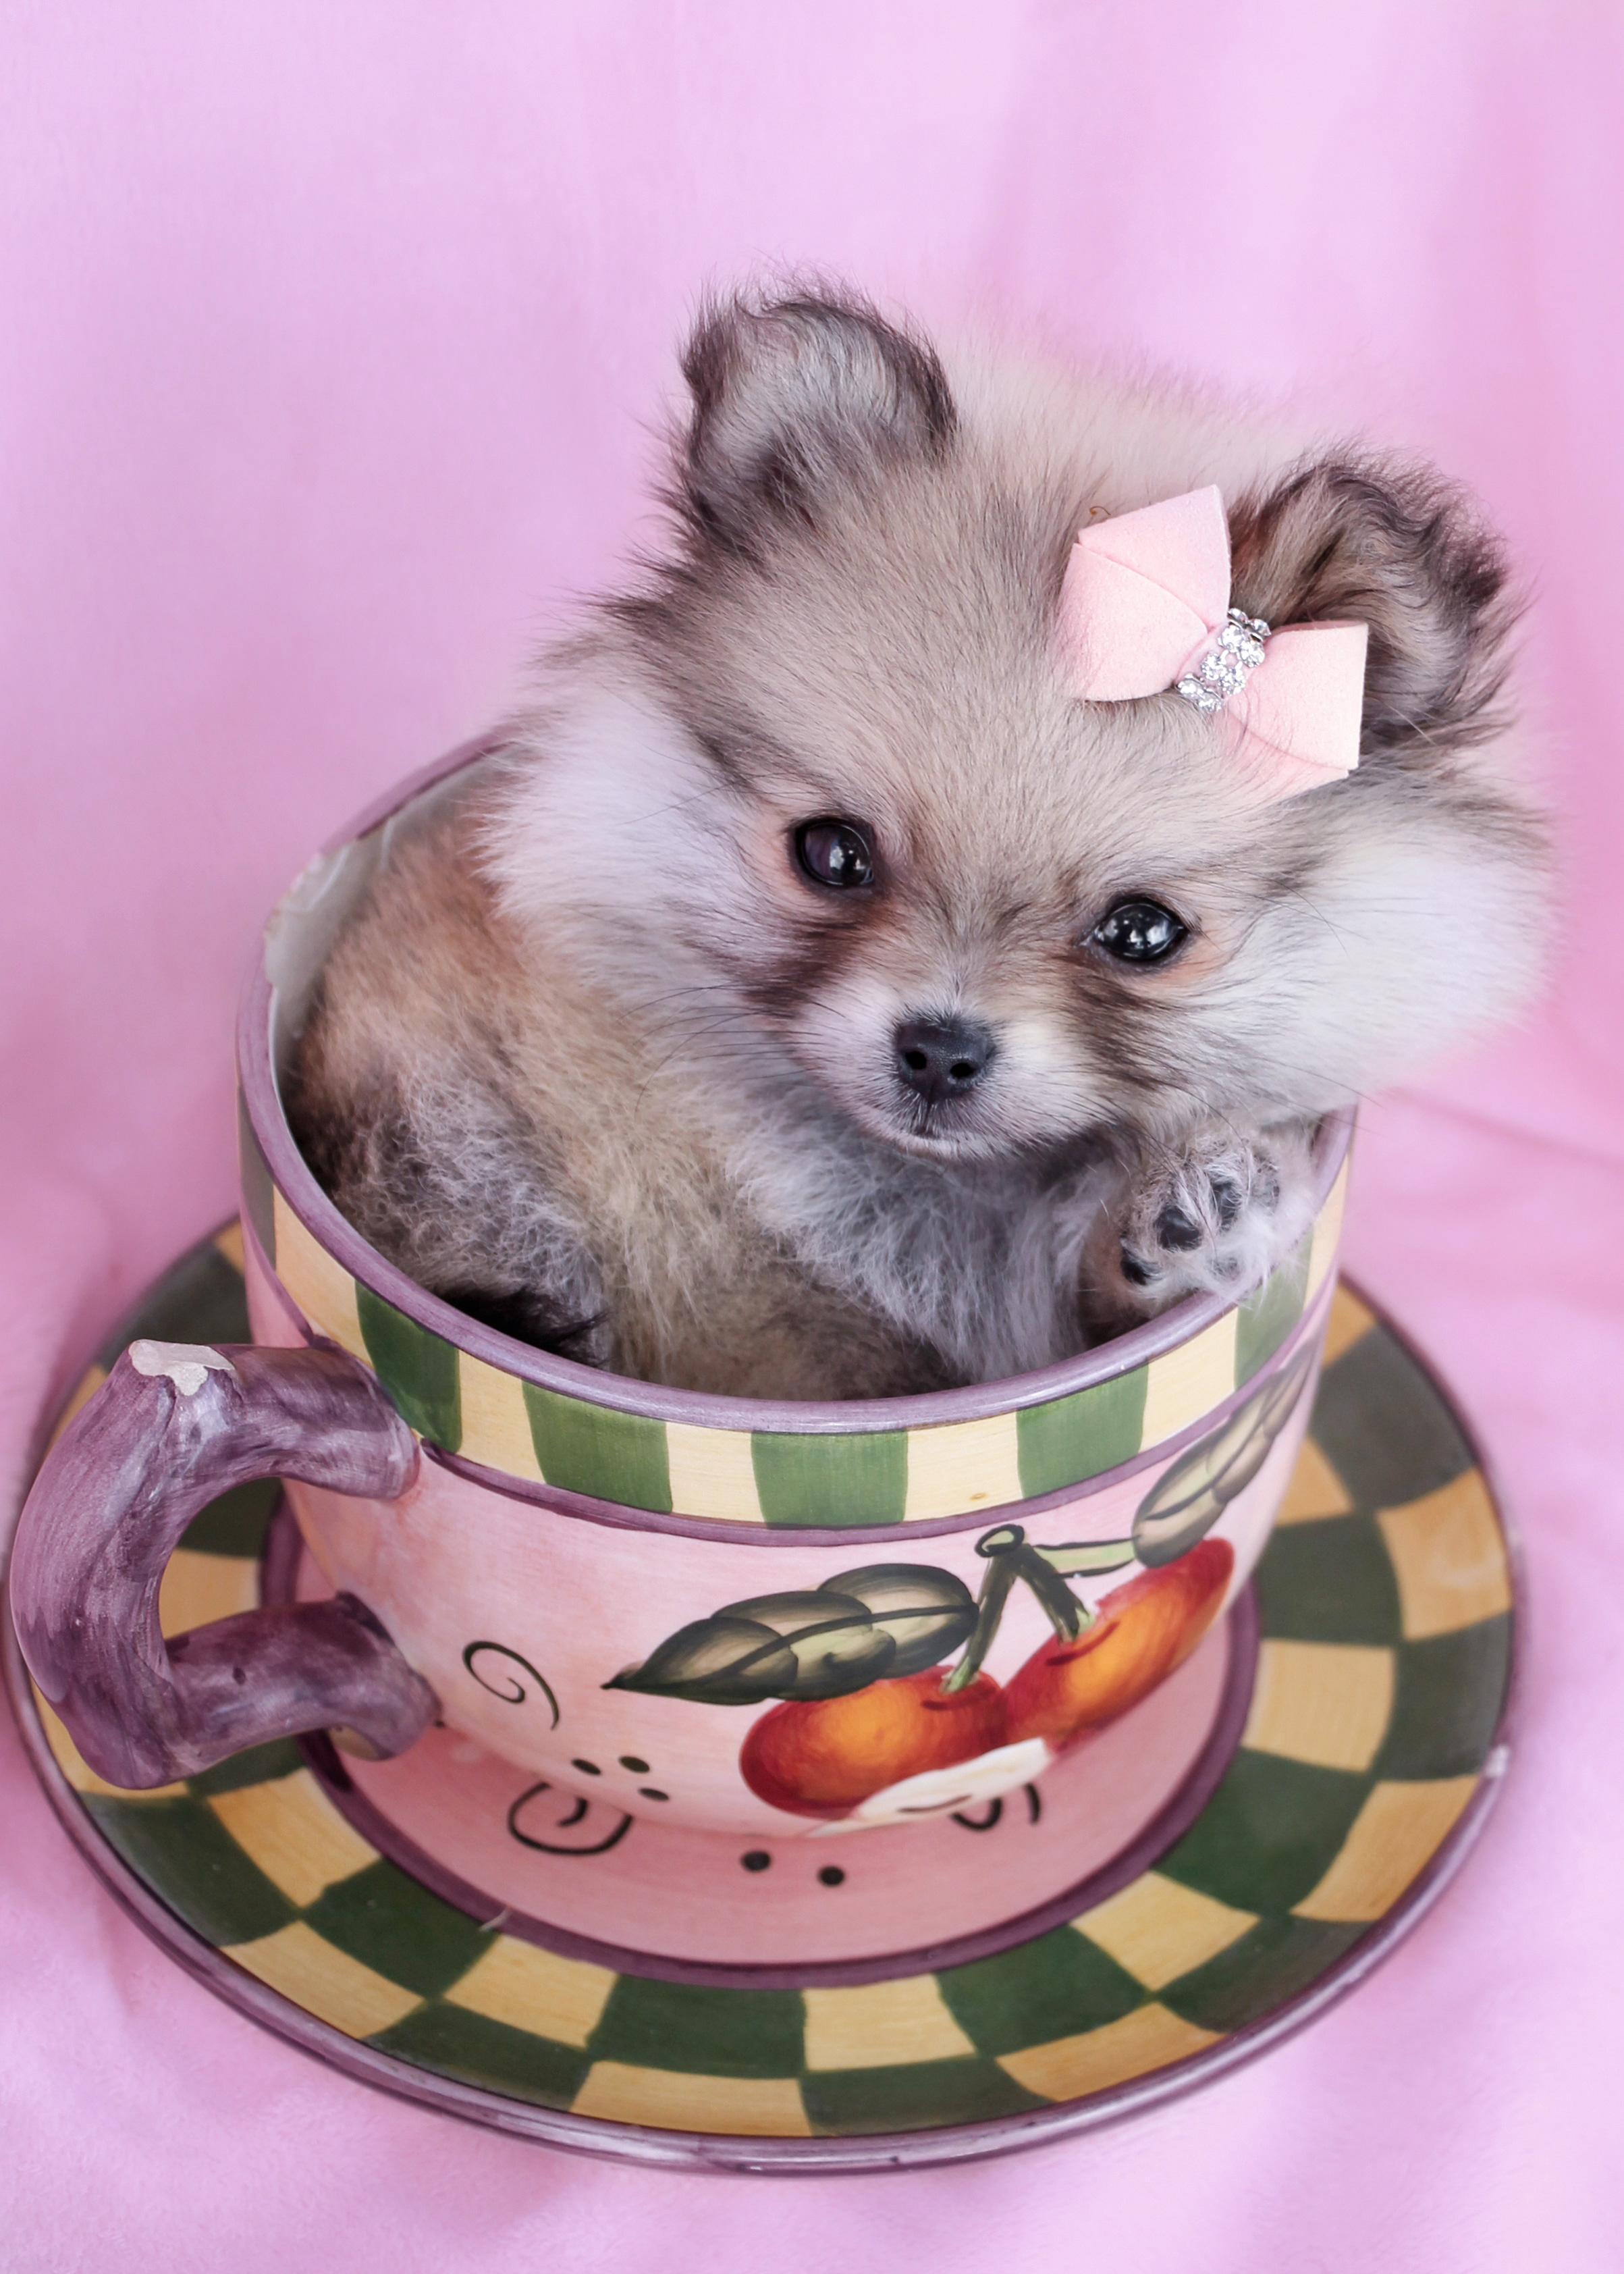 Teacup Pomeranian Puppy #021 For Sale